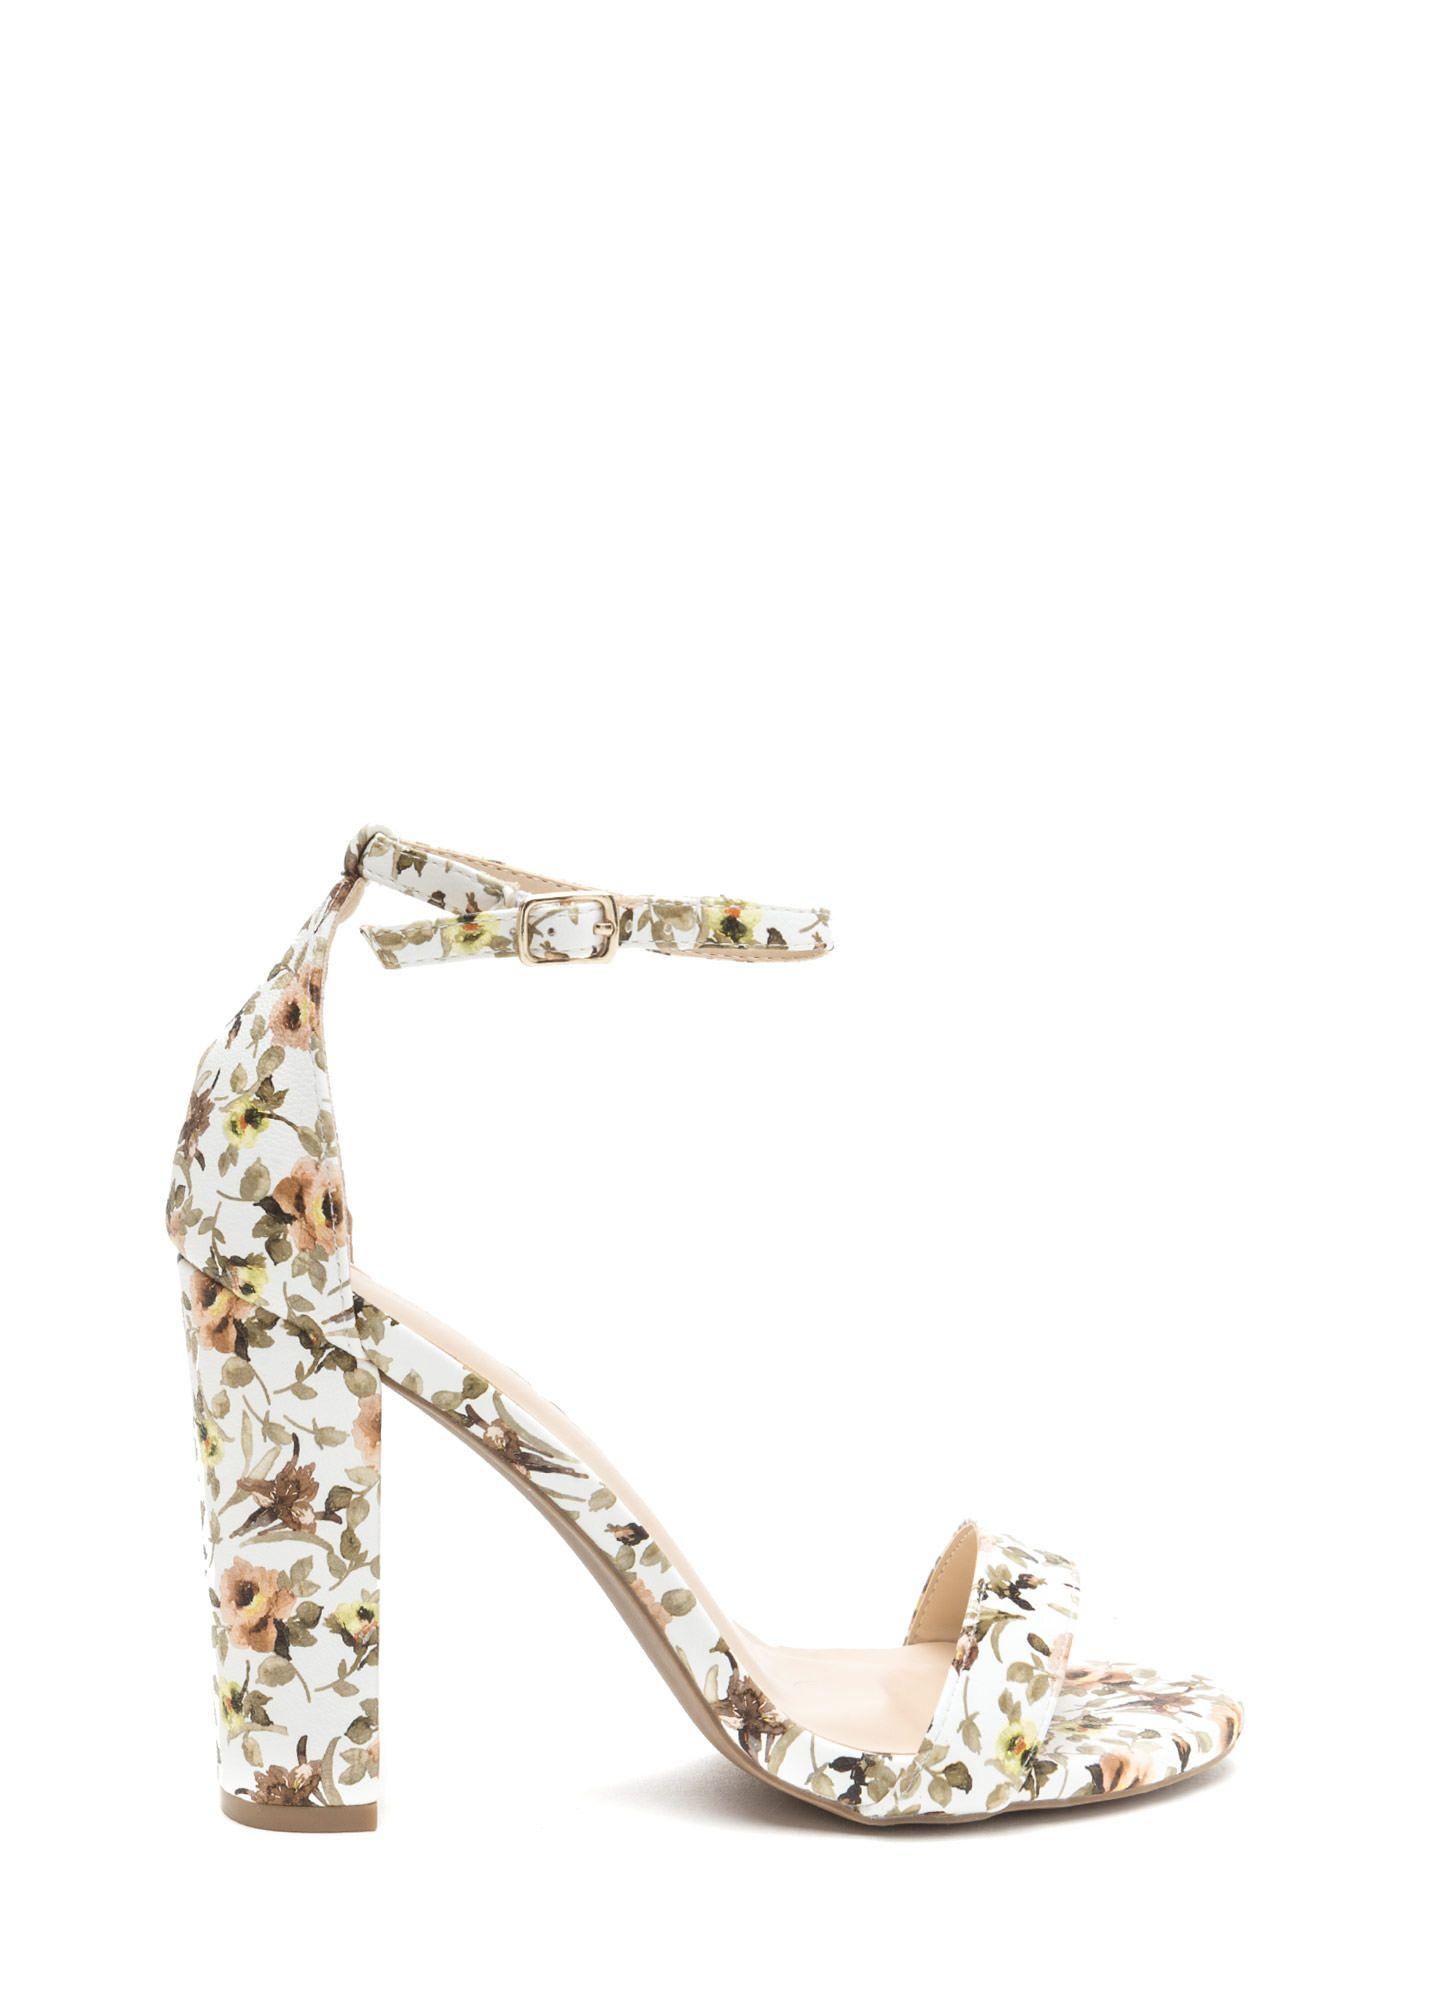 Pin de Karla Rico en zapatos en 2020 | Zapatos mujer